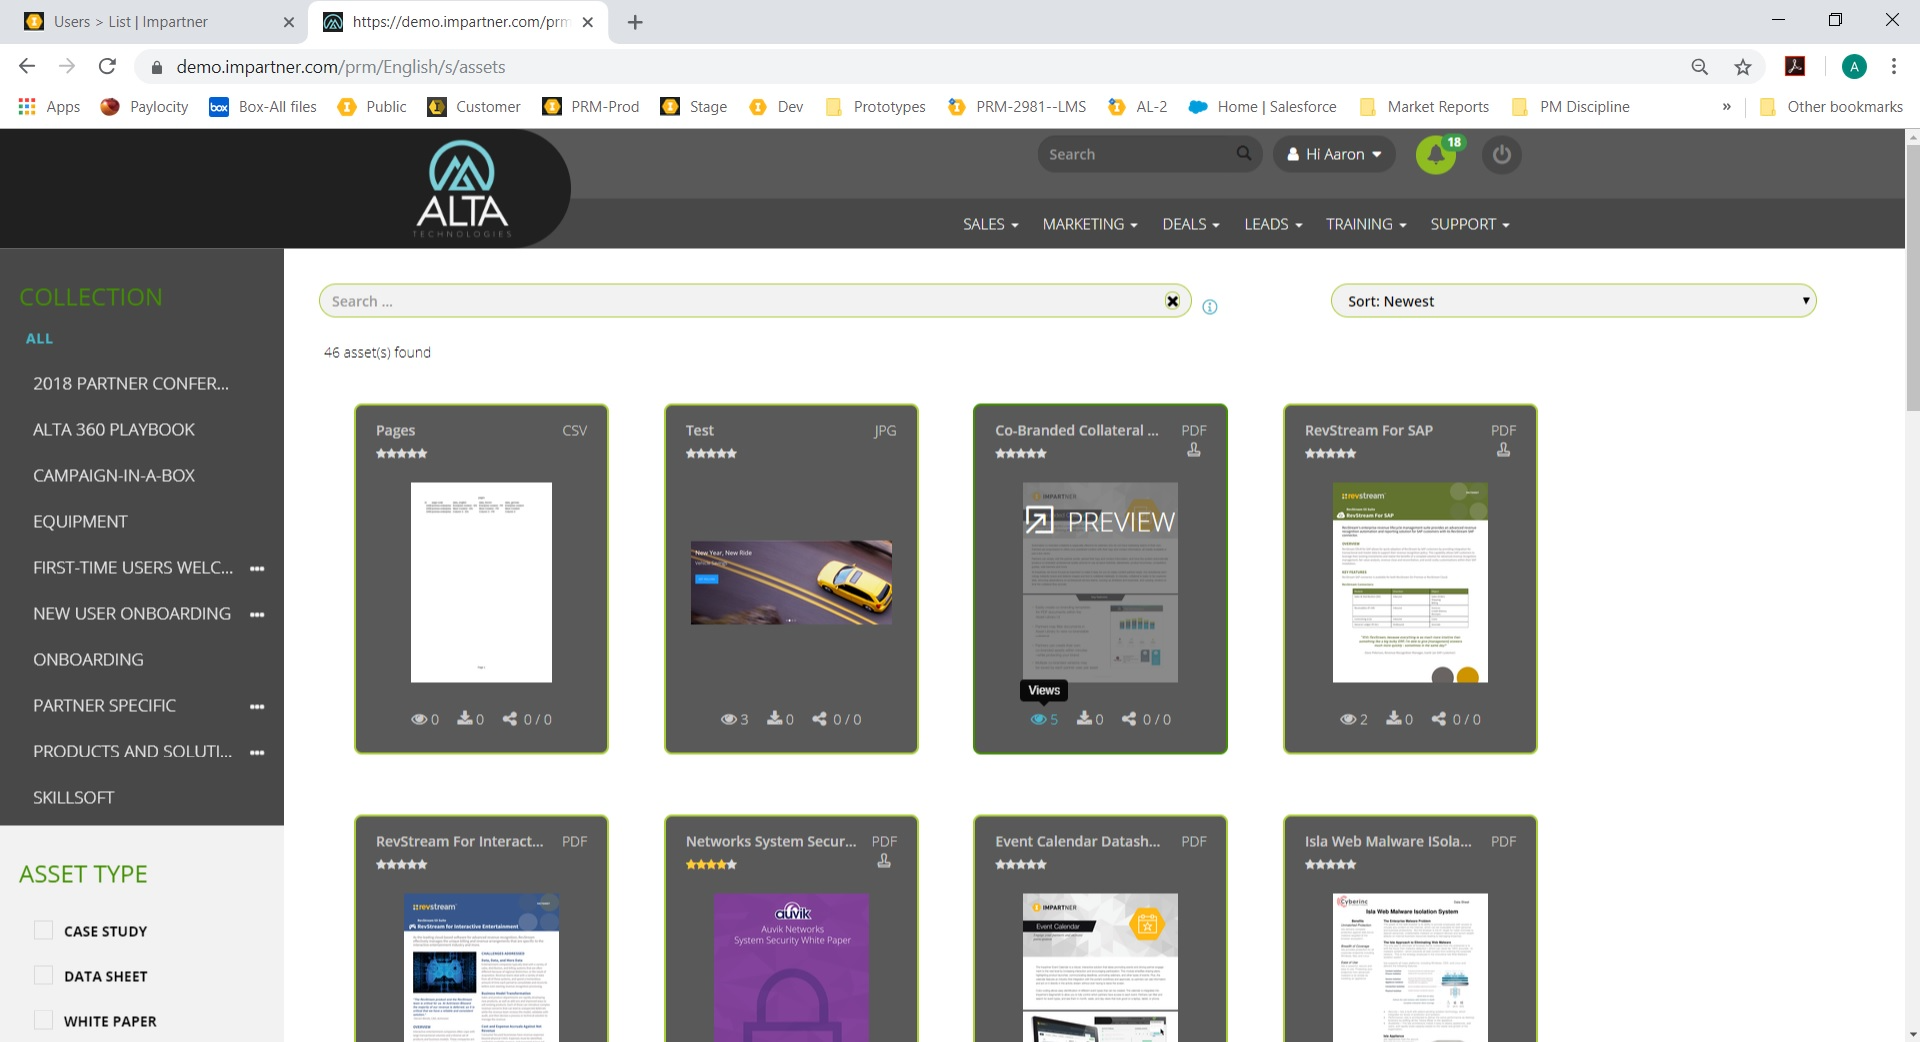 Impartner PRM content management screenshot